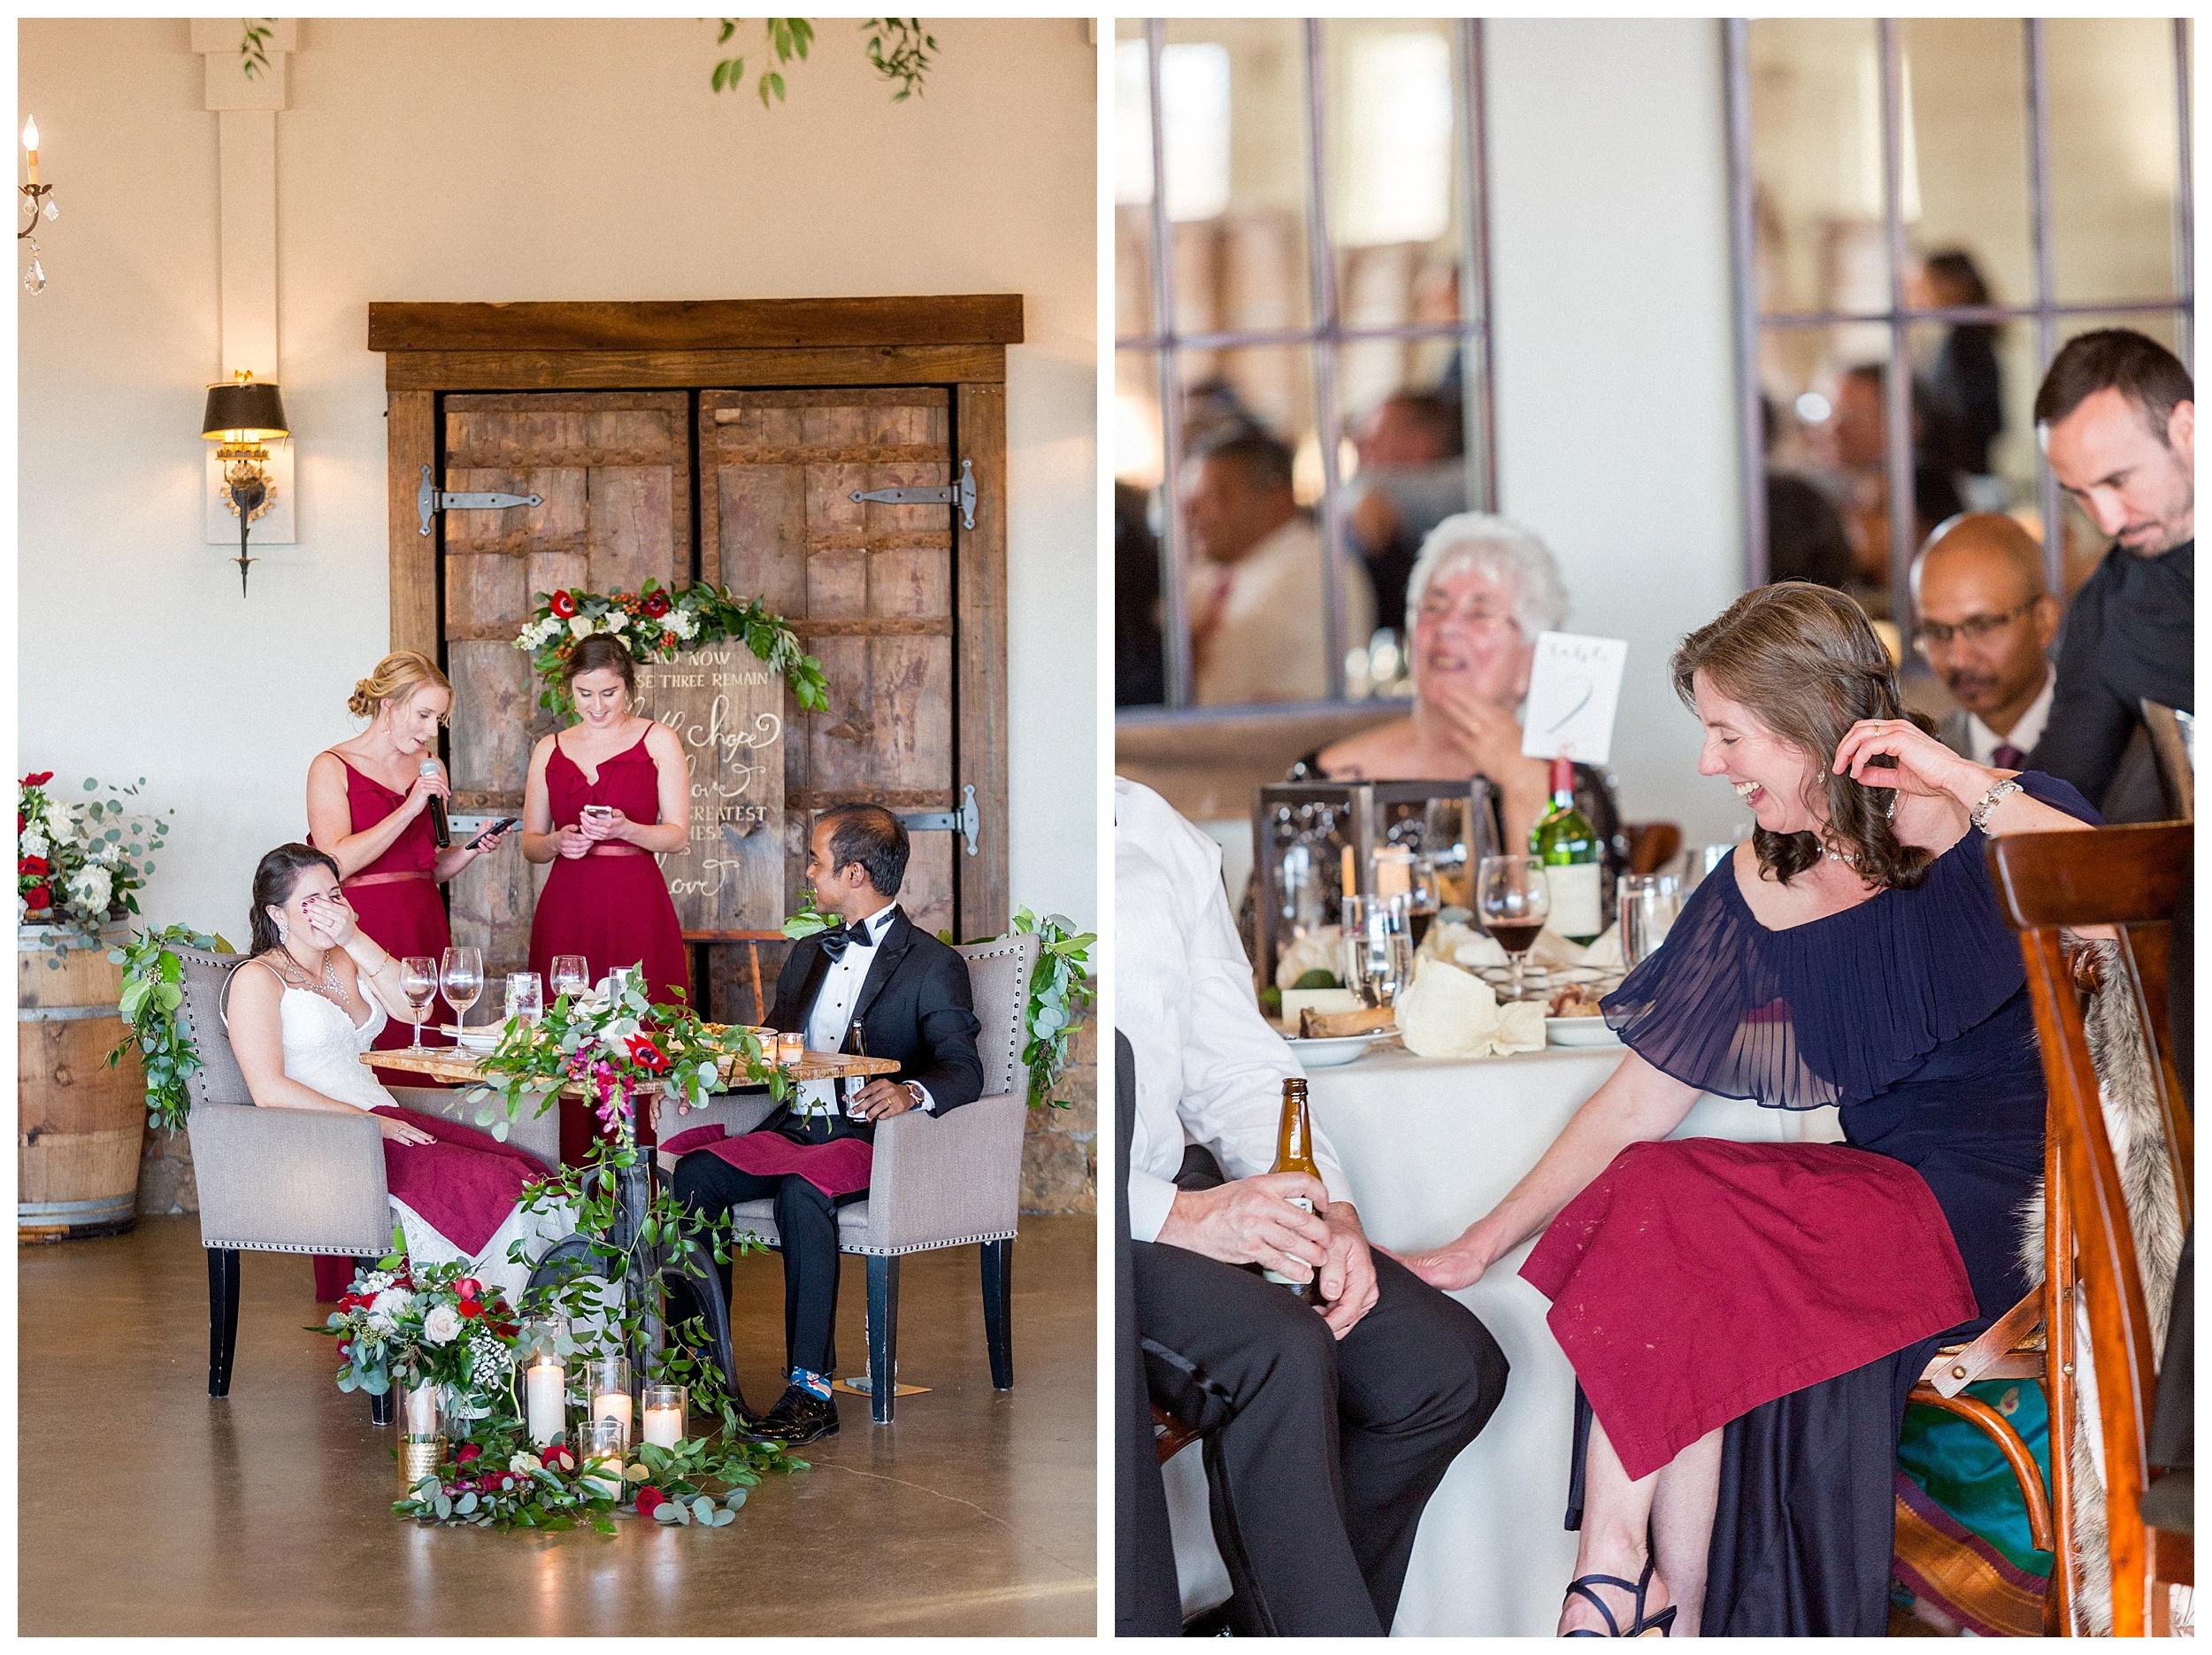 Stone Tower Winery Wedding | Virginia Winter Wedding | VA Wedding Photographer Kir Tuben_0093.jpg